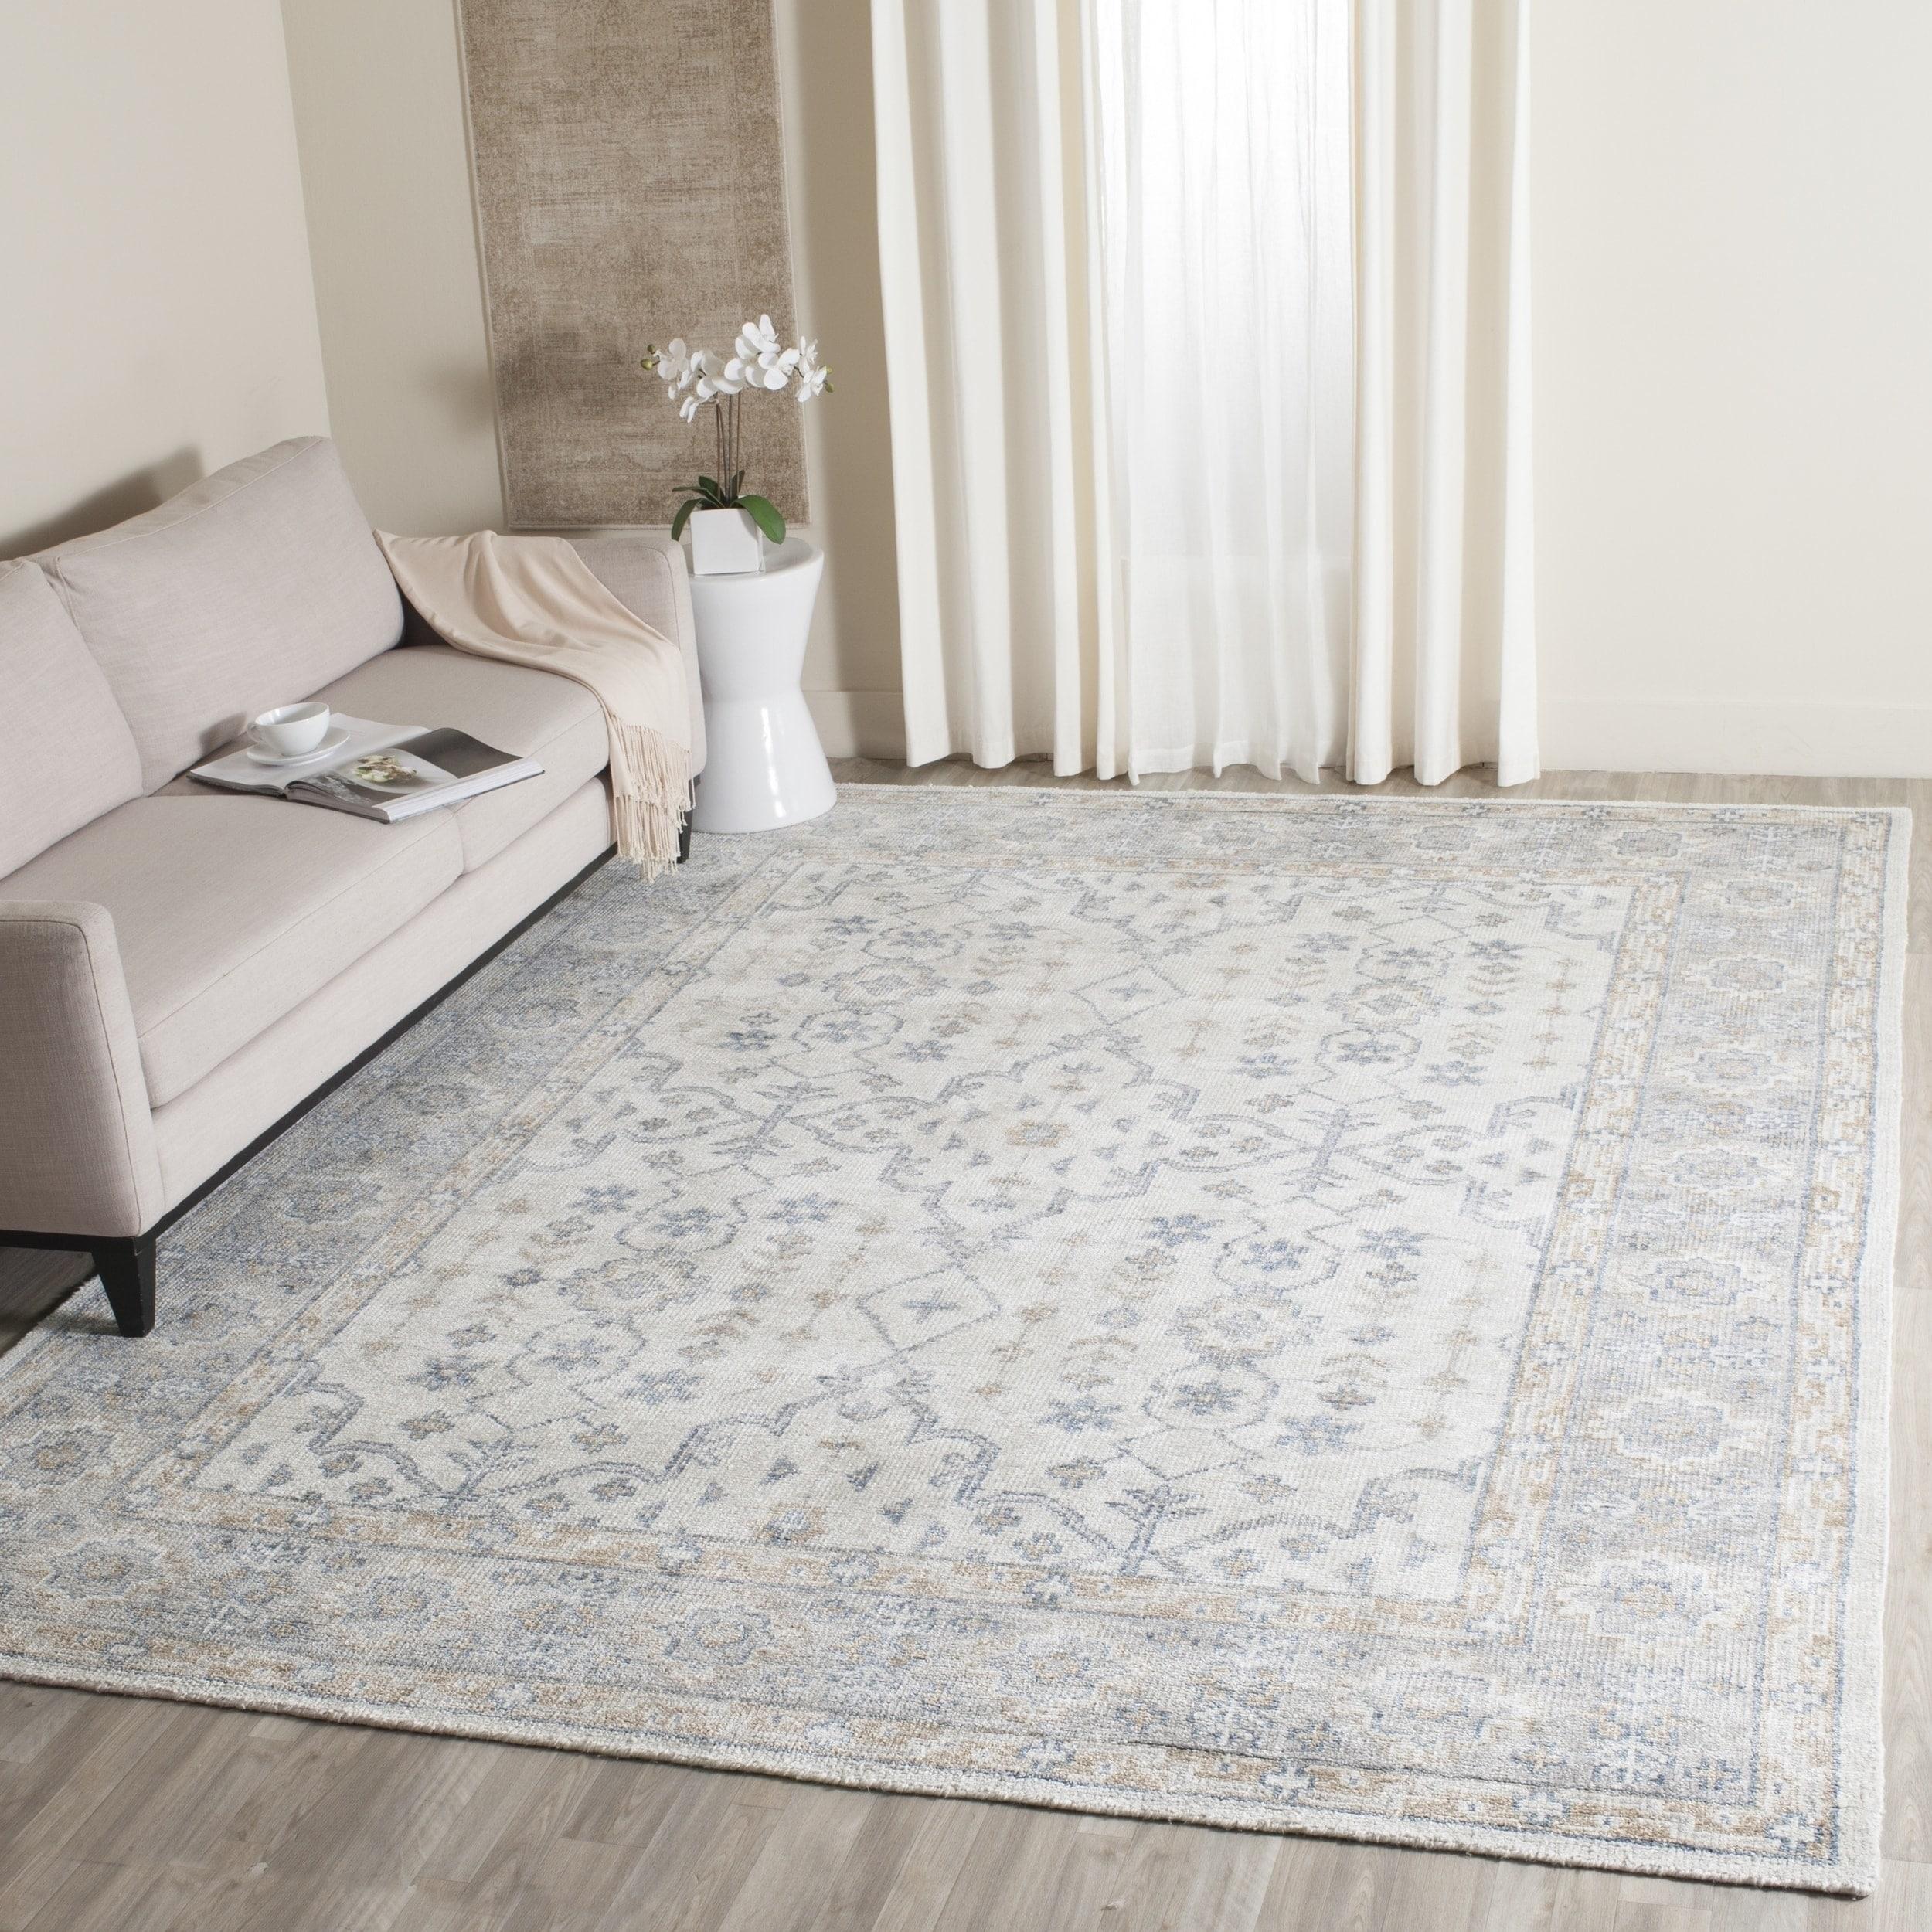 Safavieh maharaja traditional handmade ivory blue viscose rug